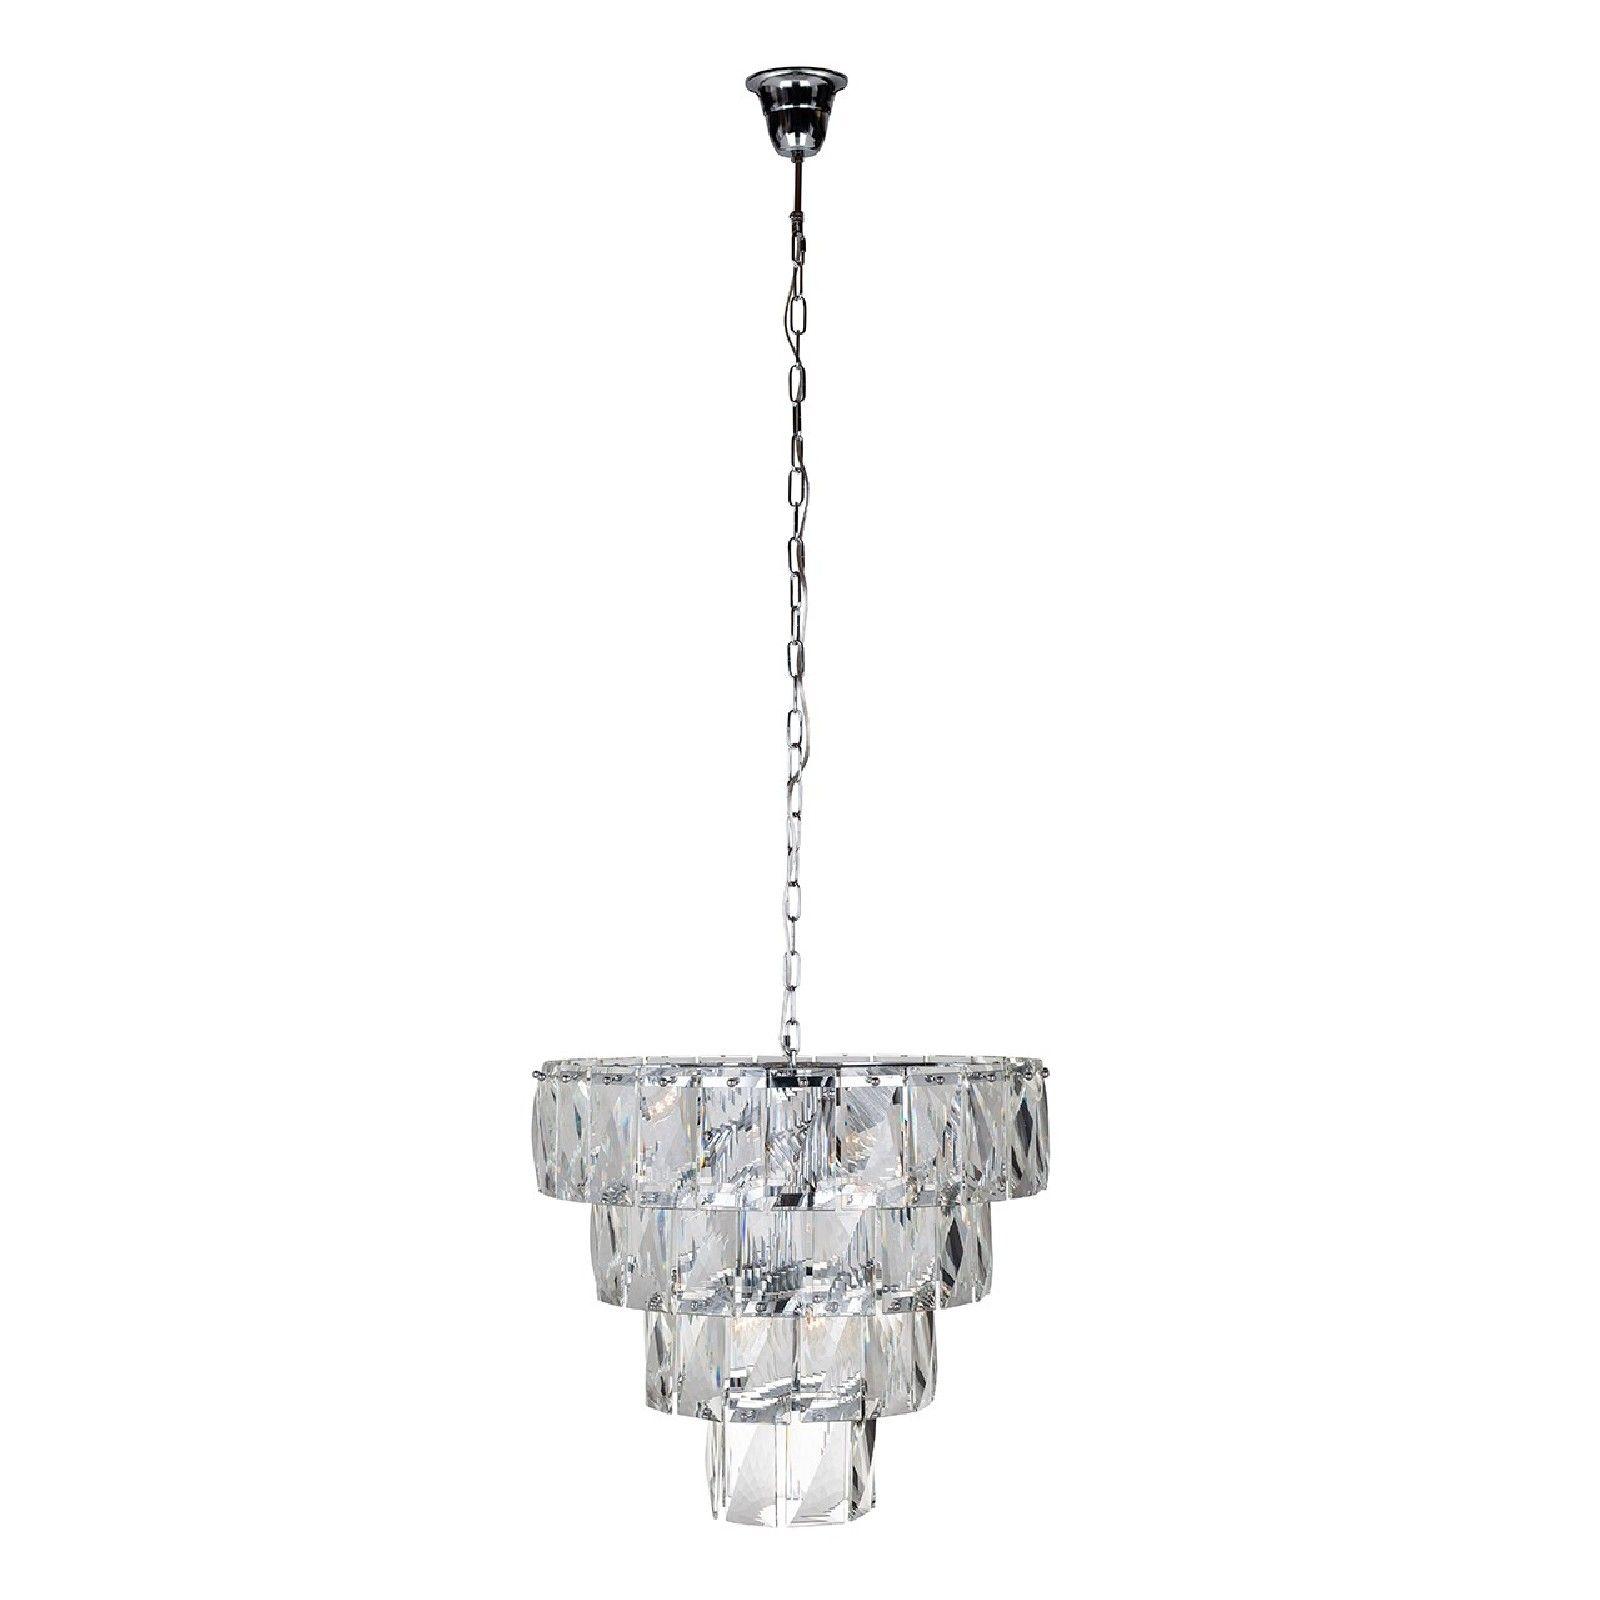 Lampe suspendue WyneE14 / 25 watts (9 pieces) Suspensions et plafonniers - 5